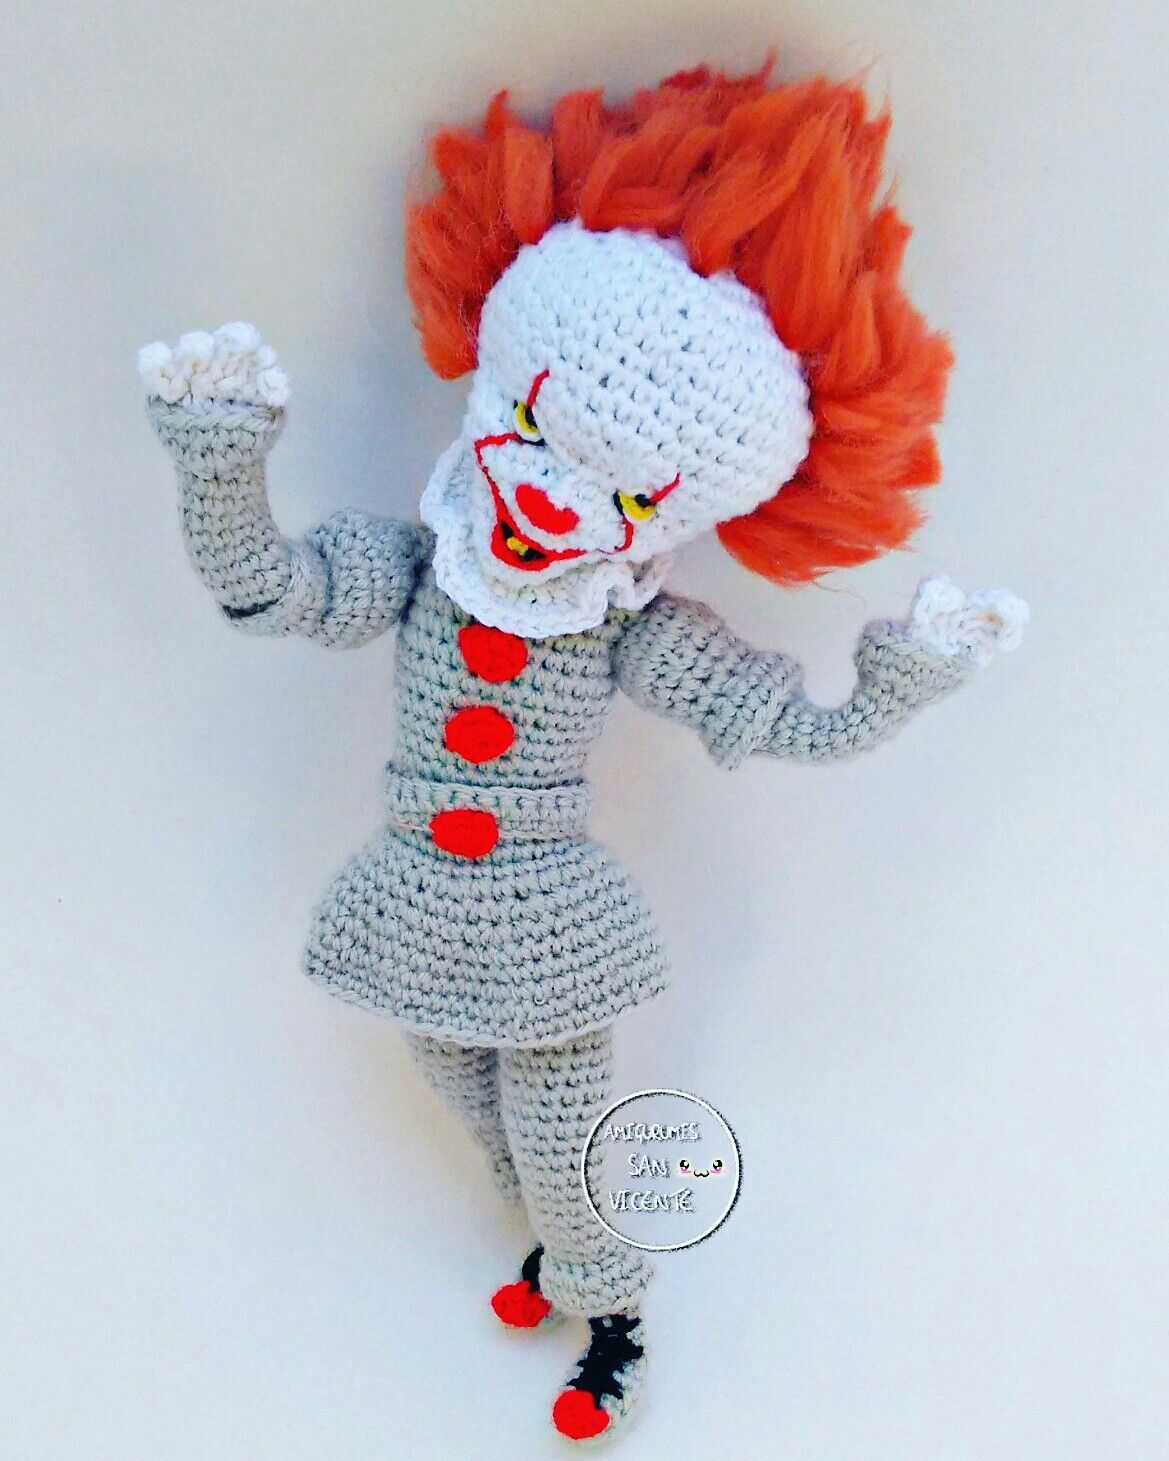 Pennywise amigurumi crochet toys pinterest amigurumi pennywise amigurumi loom crochetcrochet toyscrochet patternsvideo bankloansurffo Images